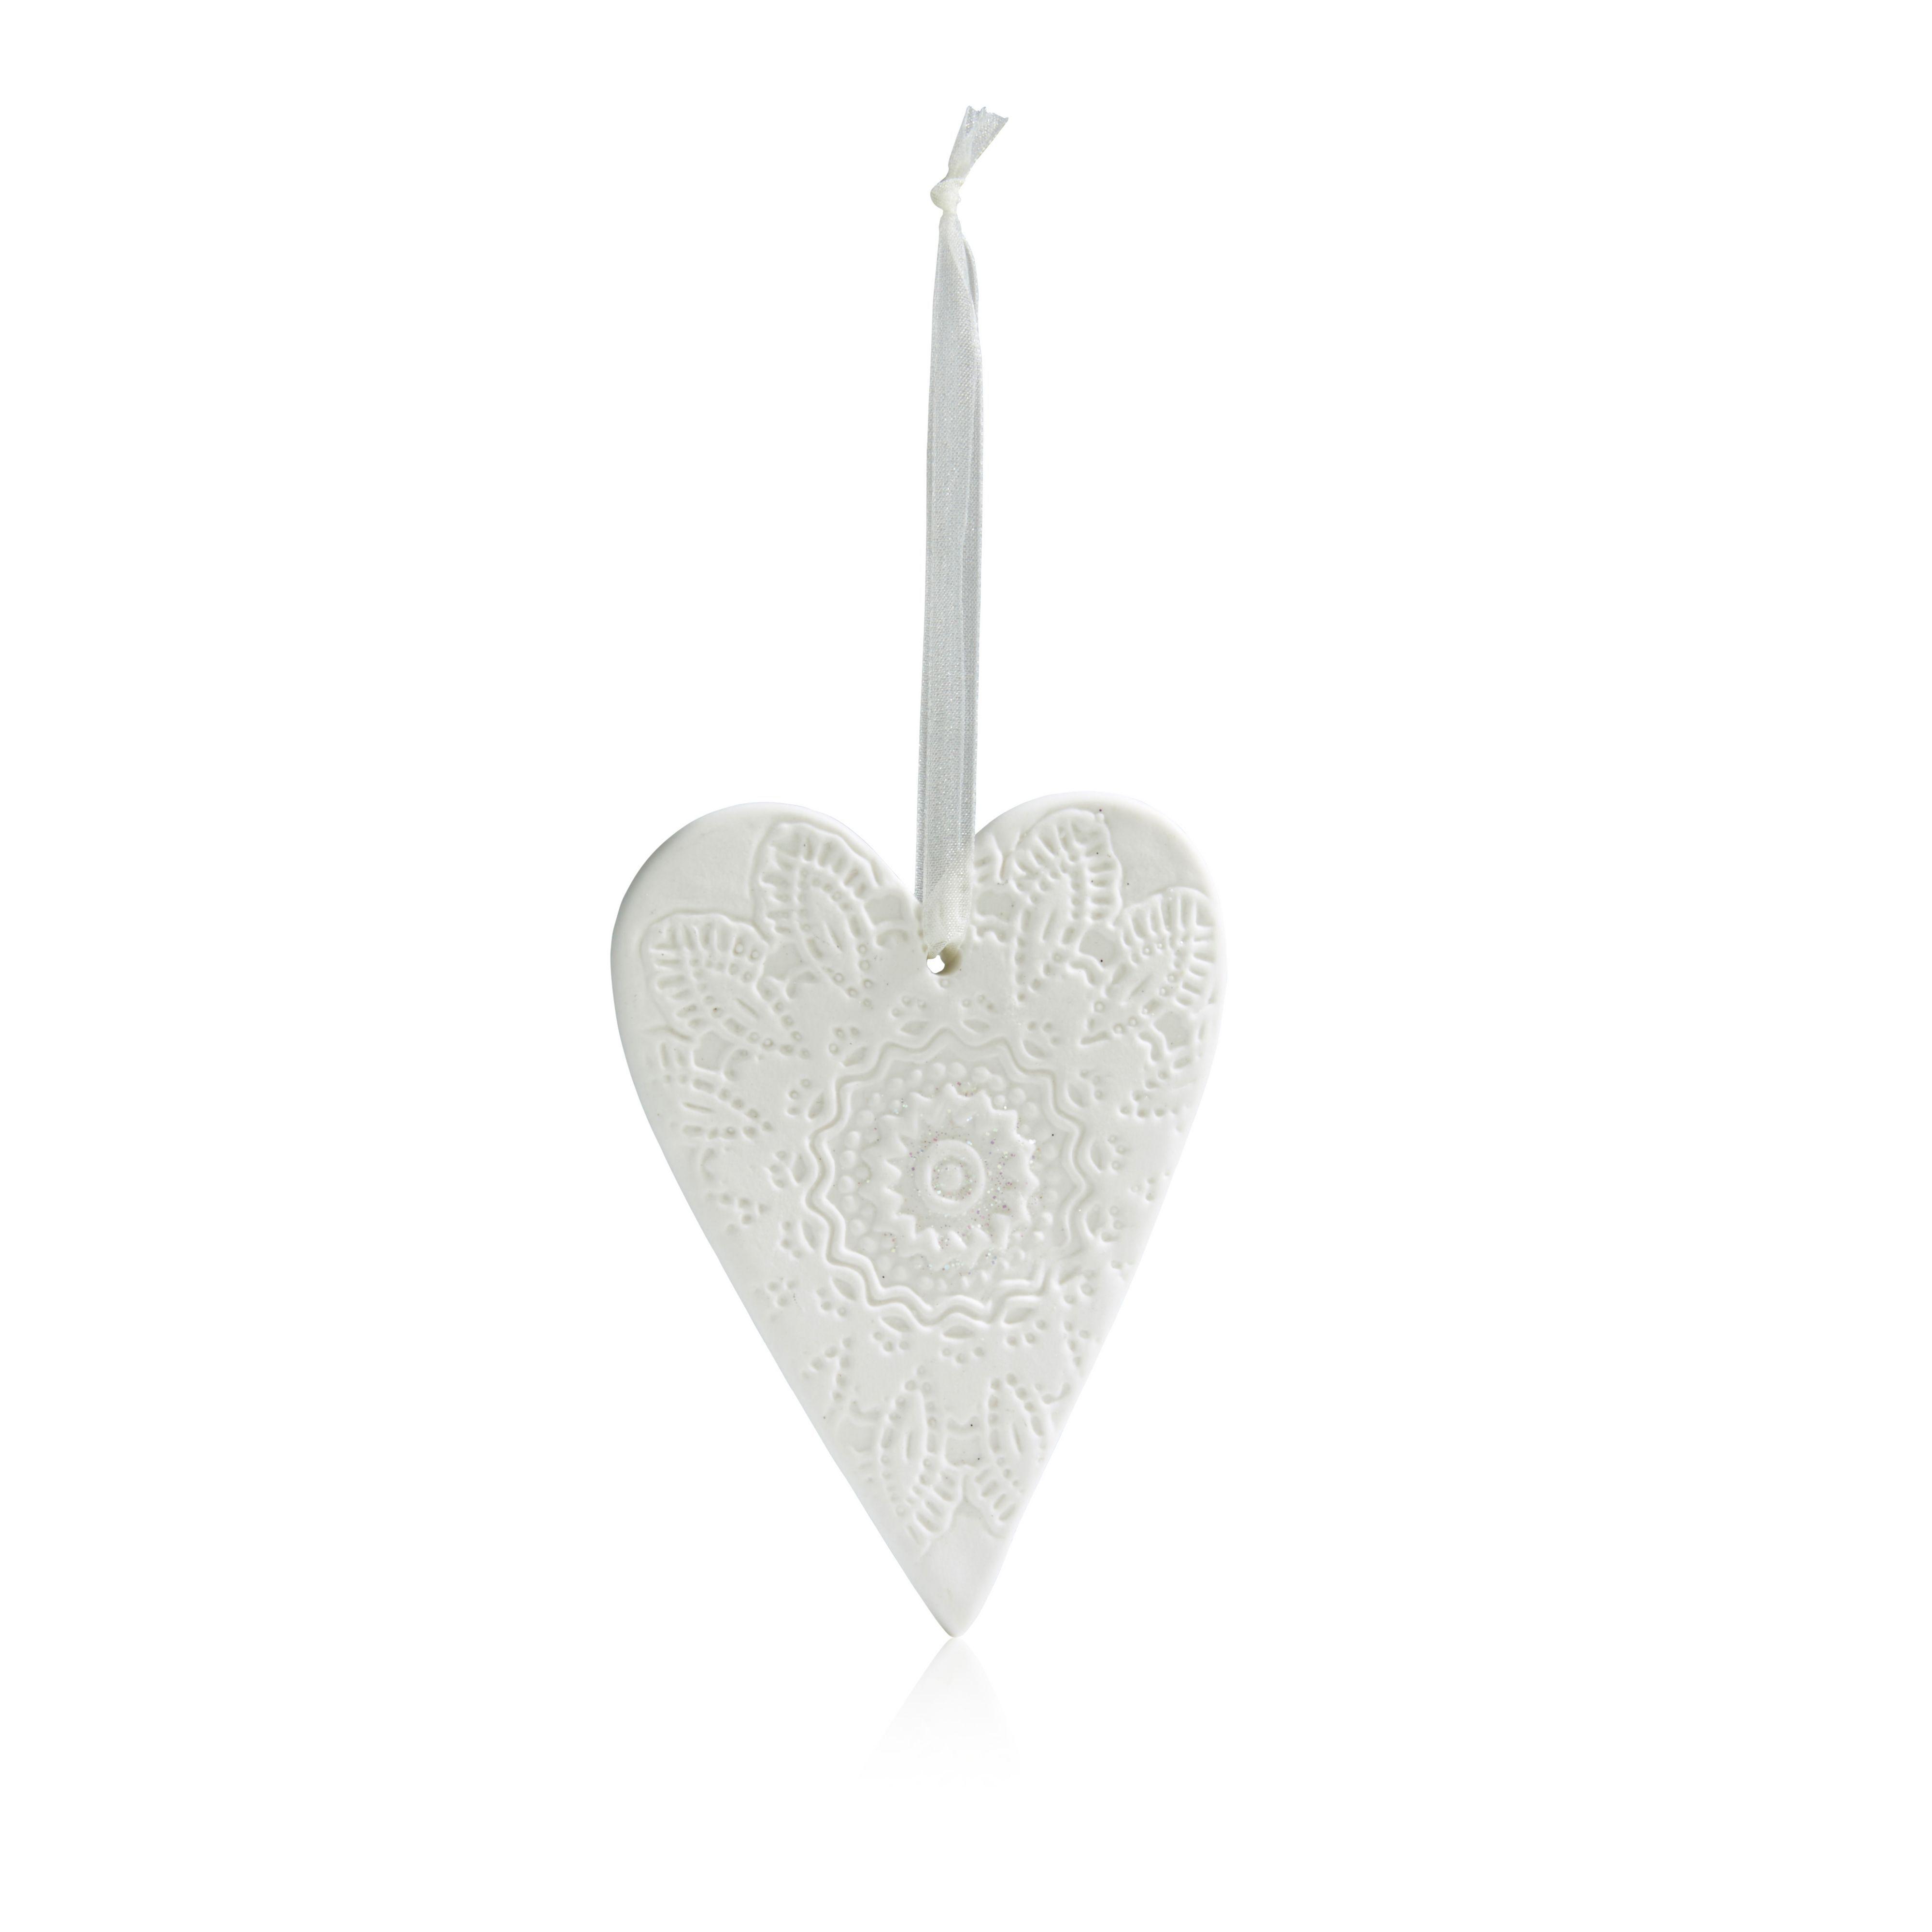 Ceramic White Heart Tree Decoration | Departments | DIY at B&Q